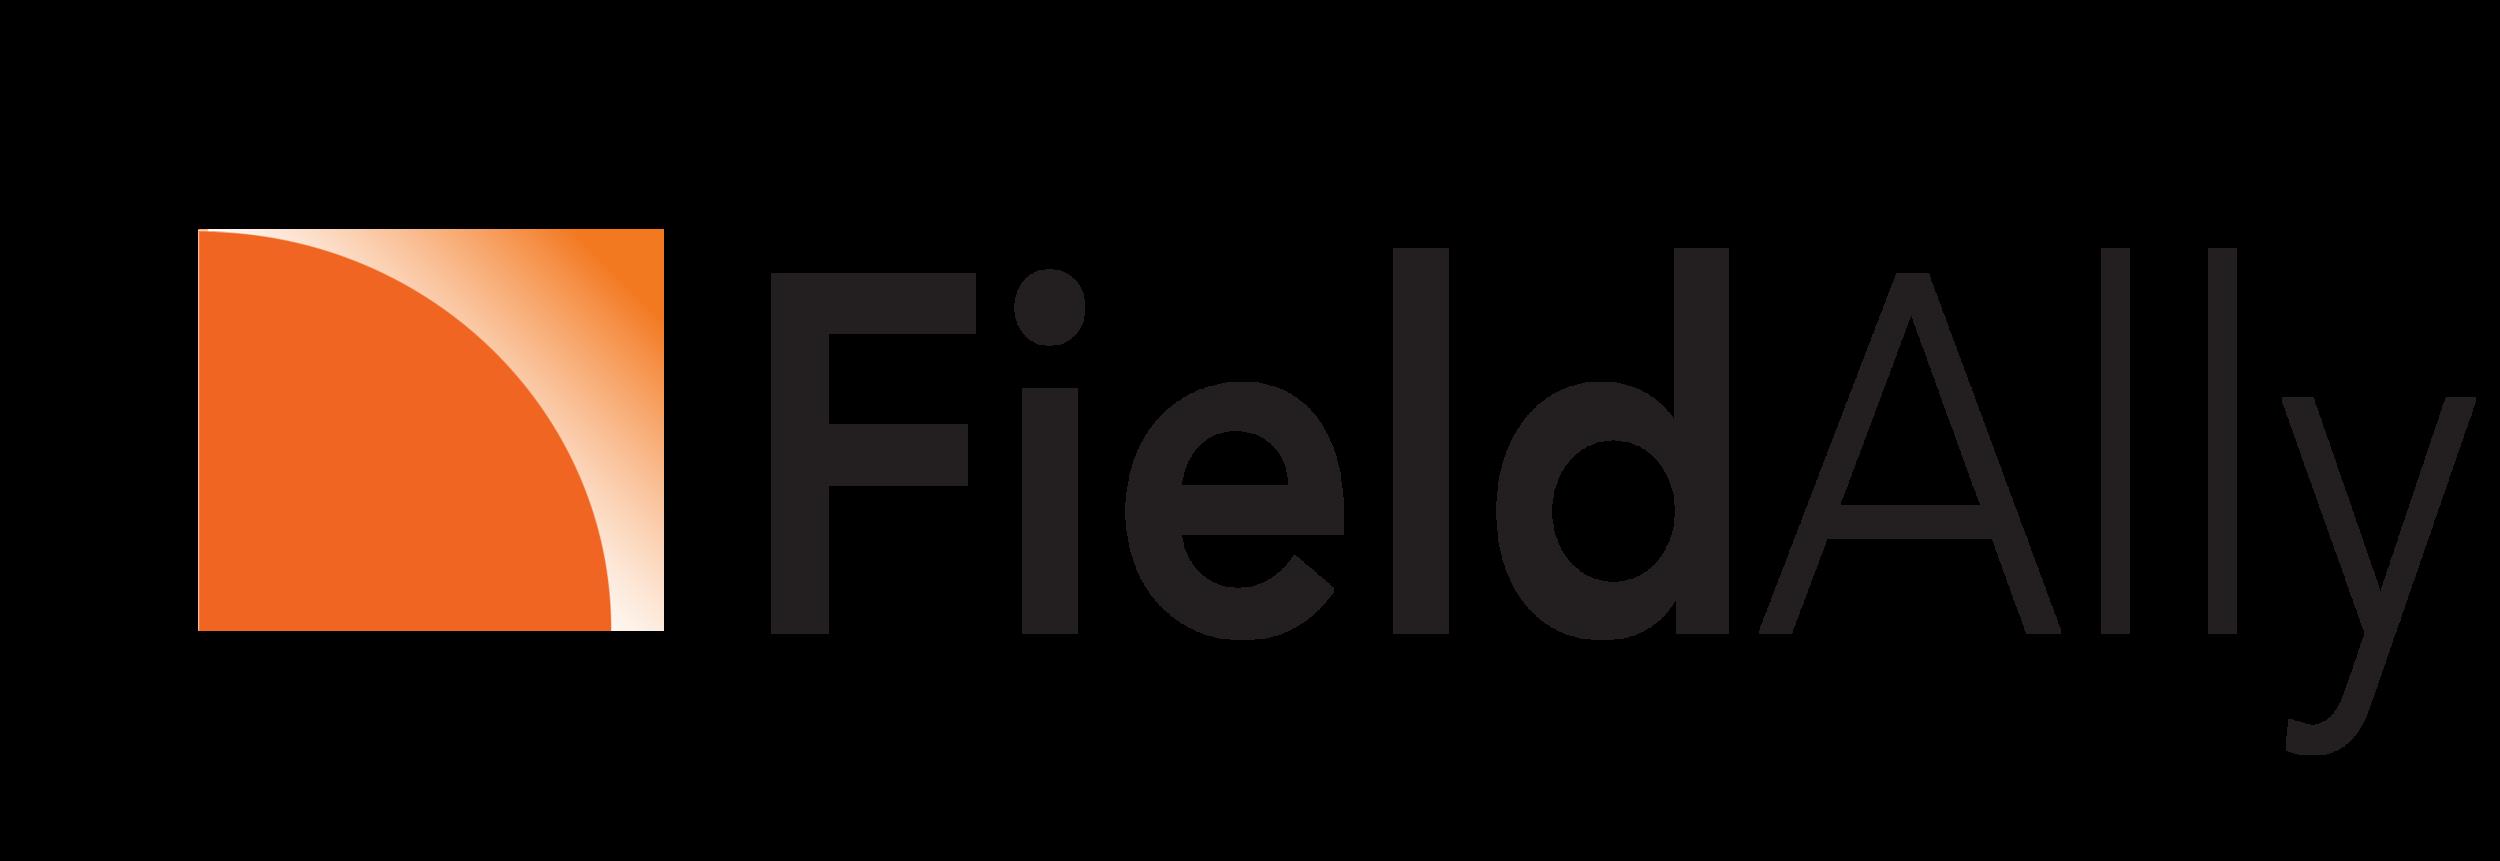 FieldAlly Black_Registered-Web.png